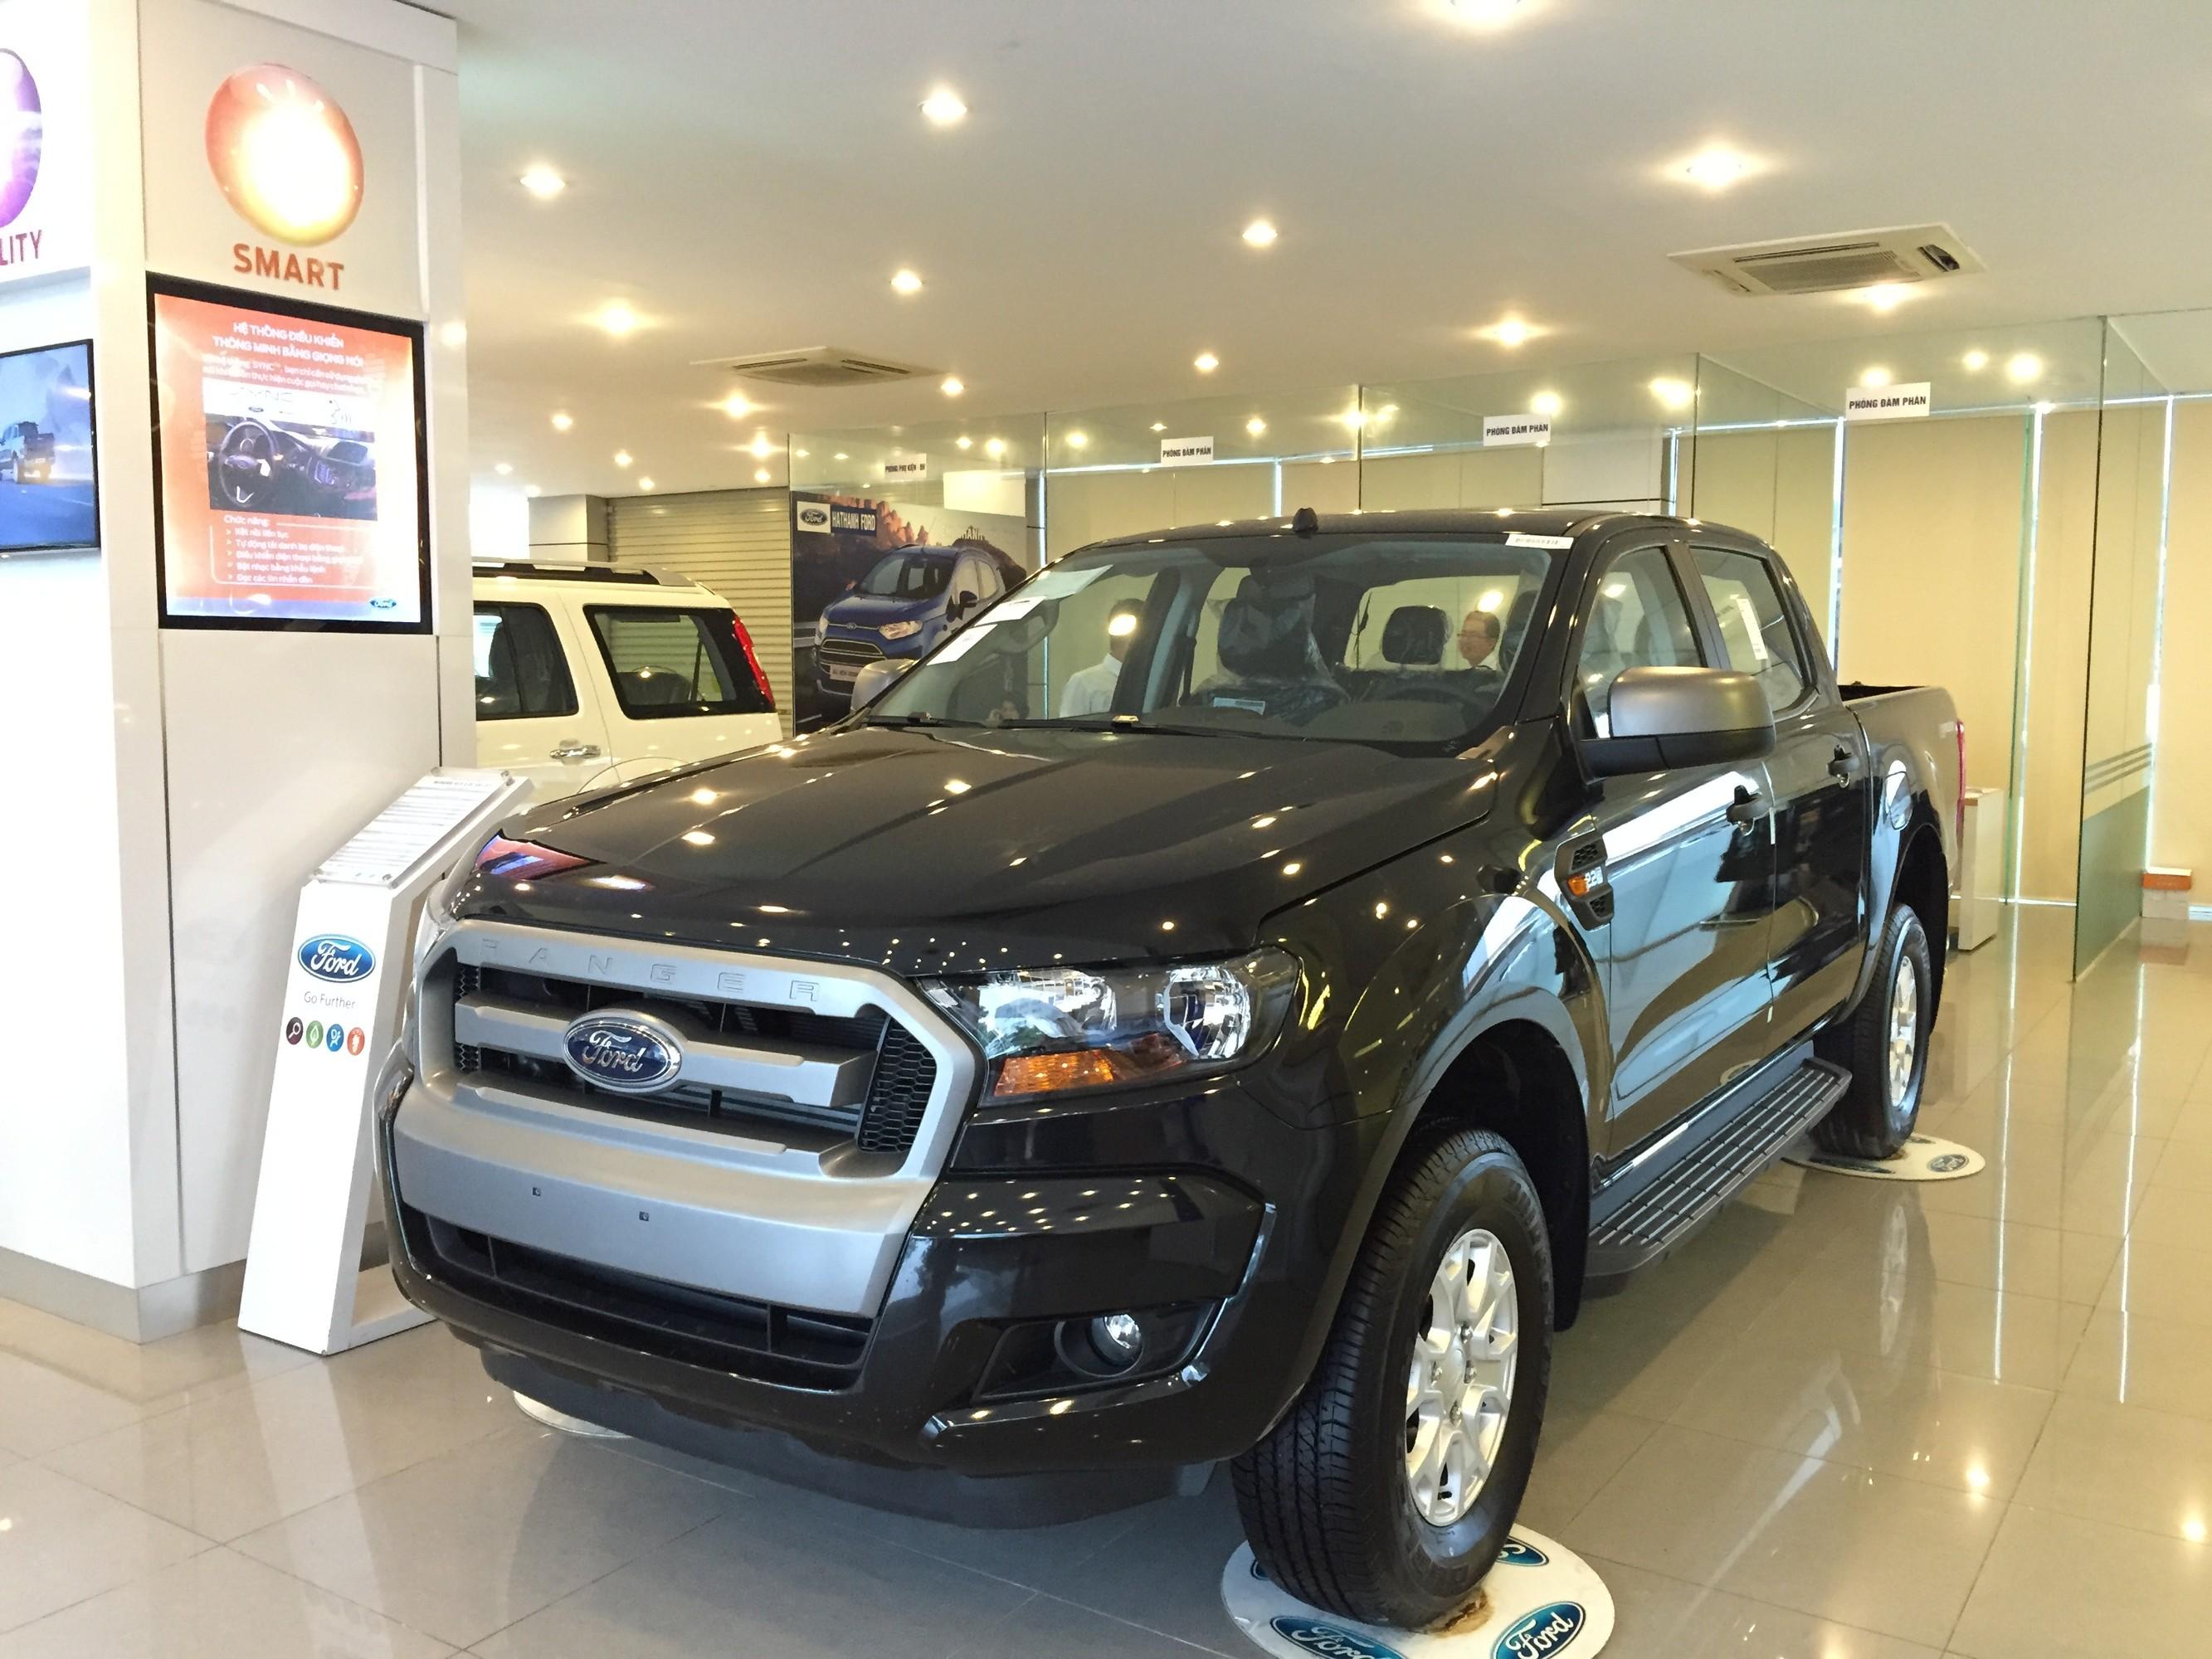 xe ford rxe bán tải Ford Rangeranger 2017